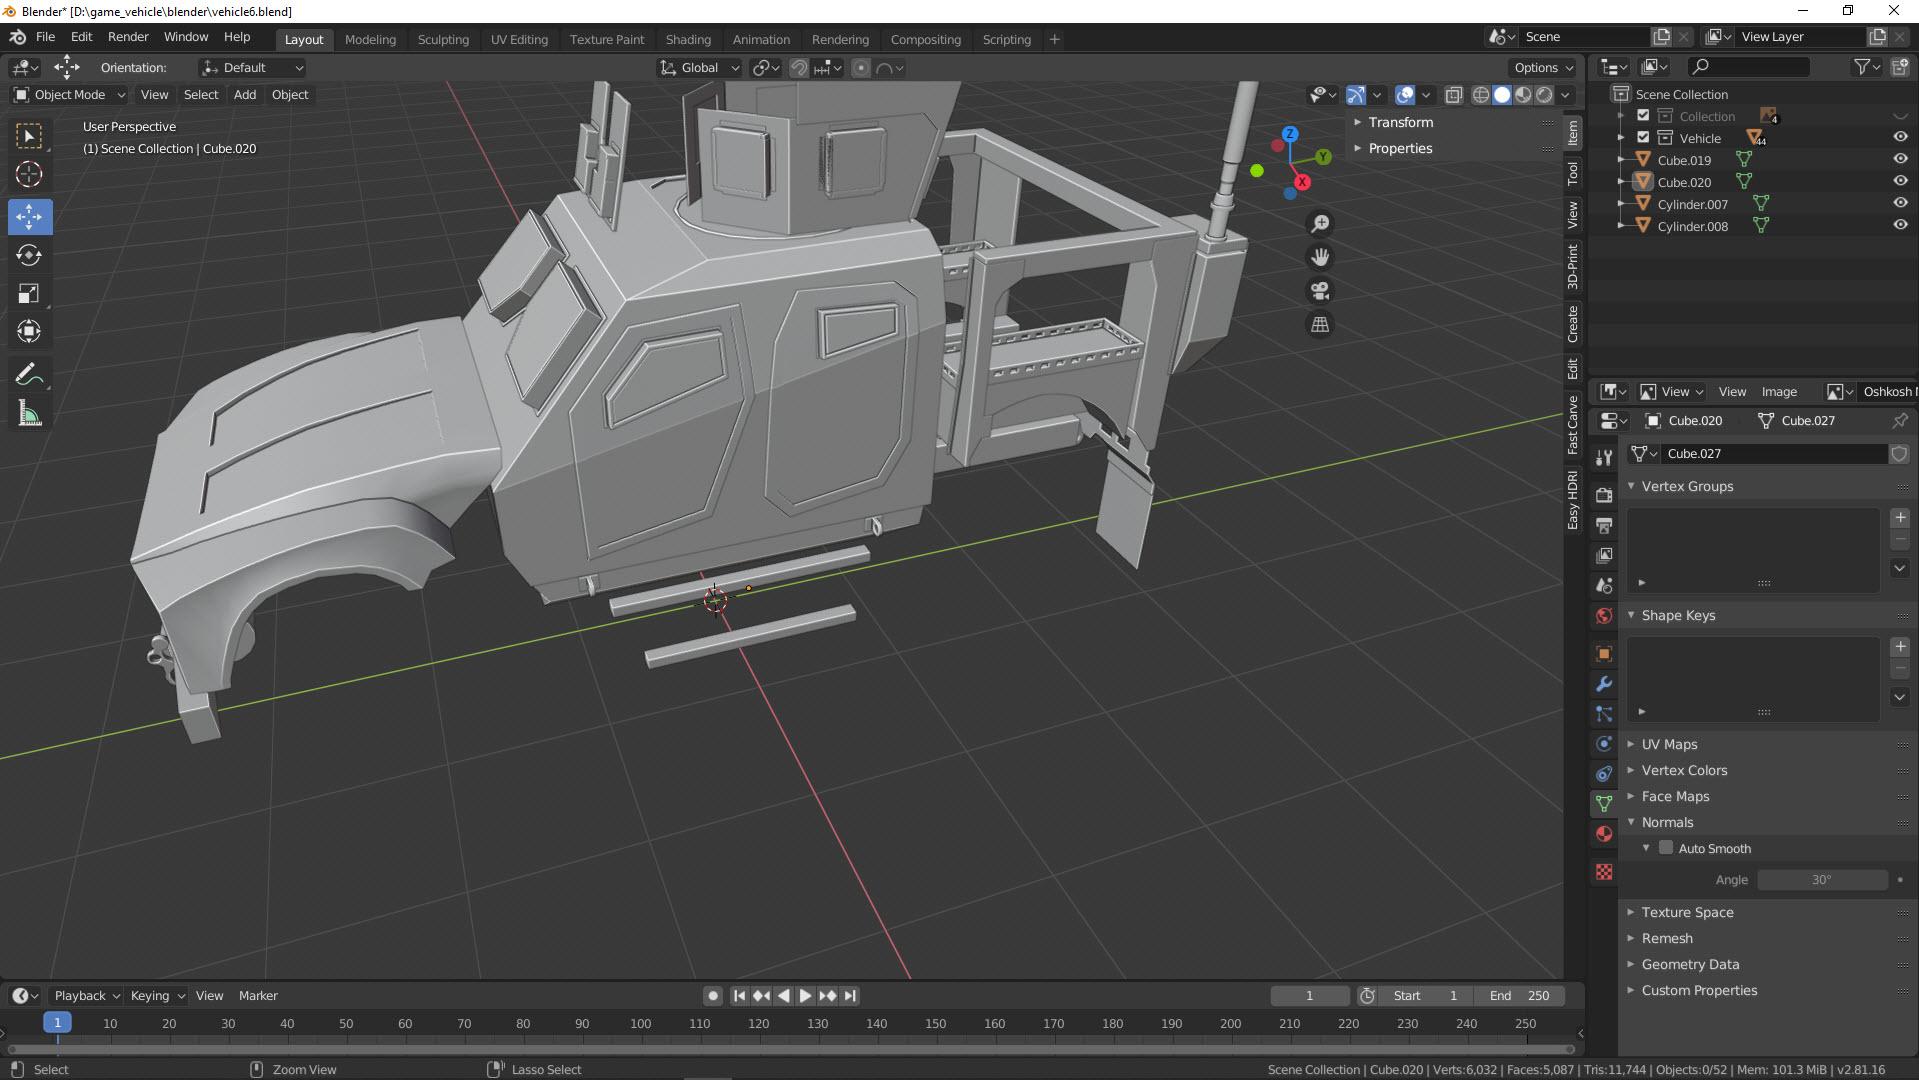 Blender 2.8.1 Game Vehicle Creation